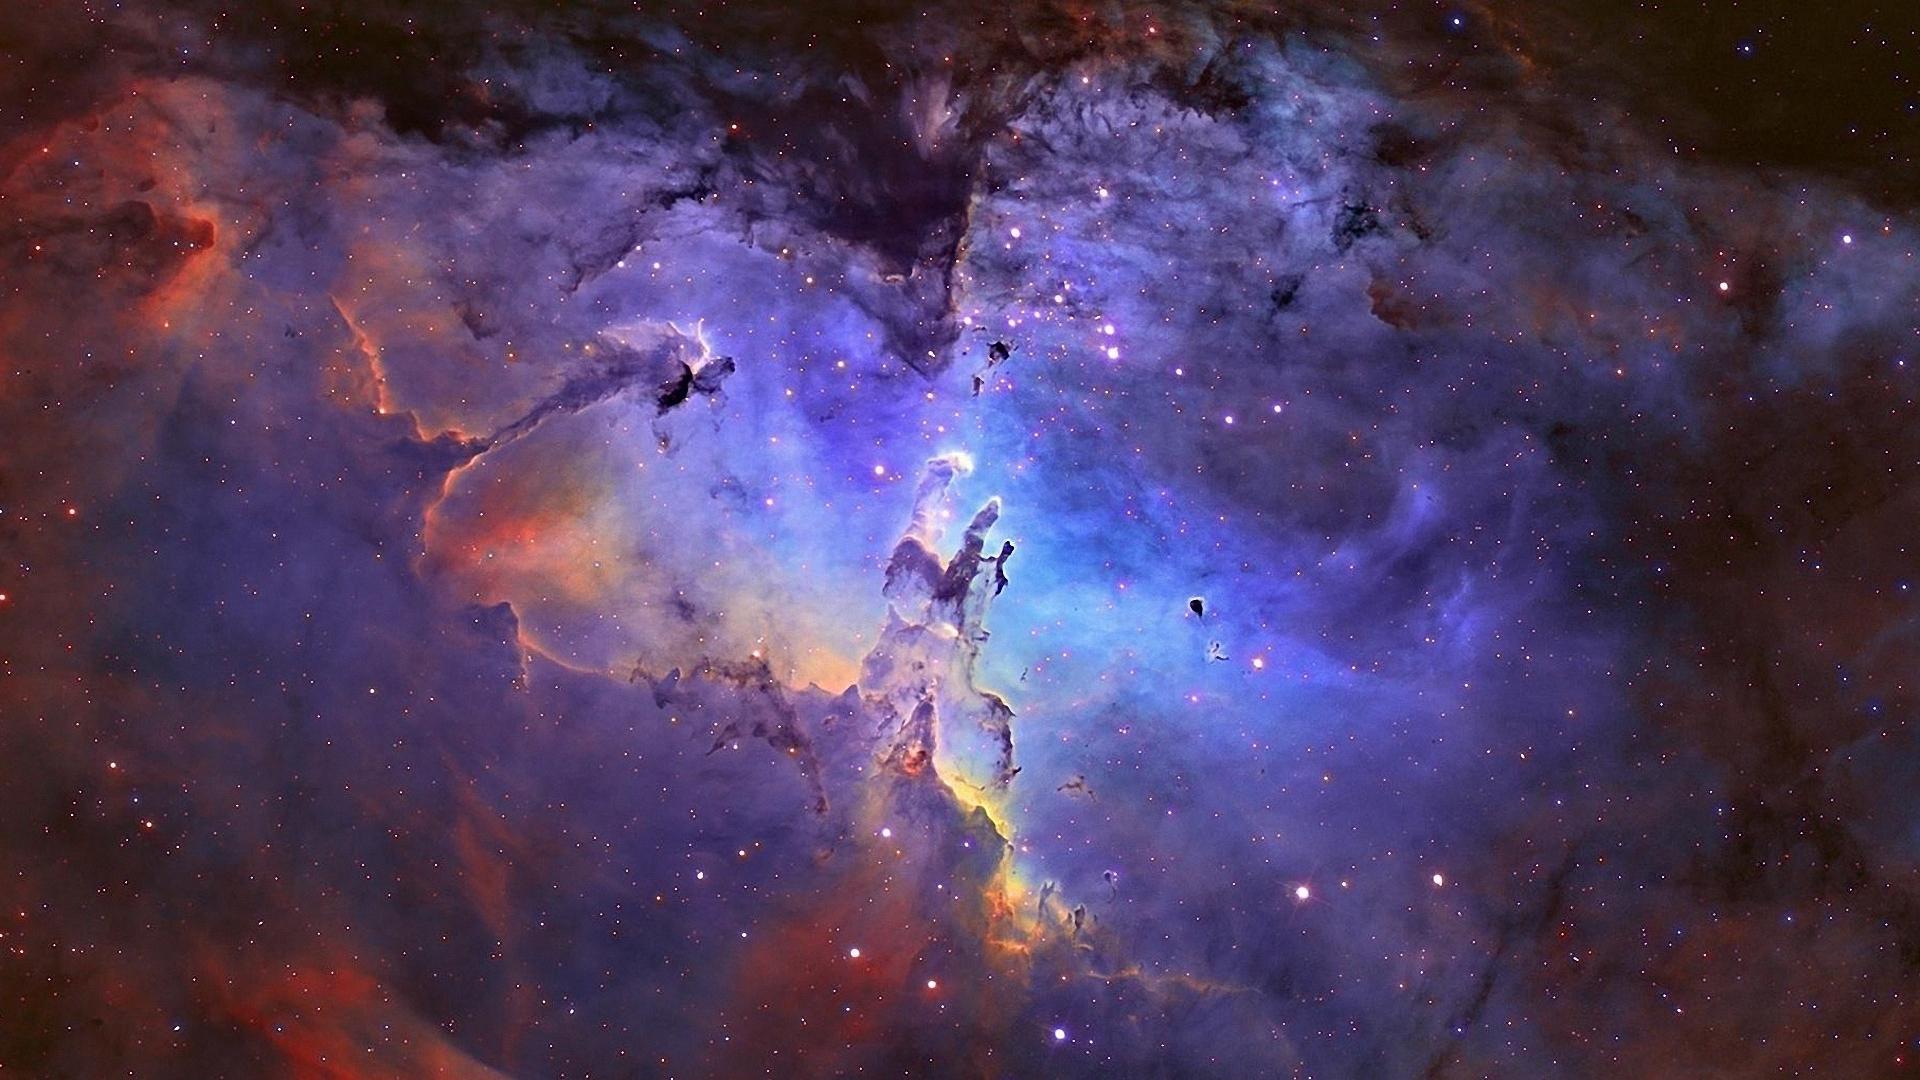 free 1920x1080 space eagle nebula universe wallpapers full hd 1080p